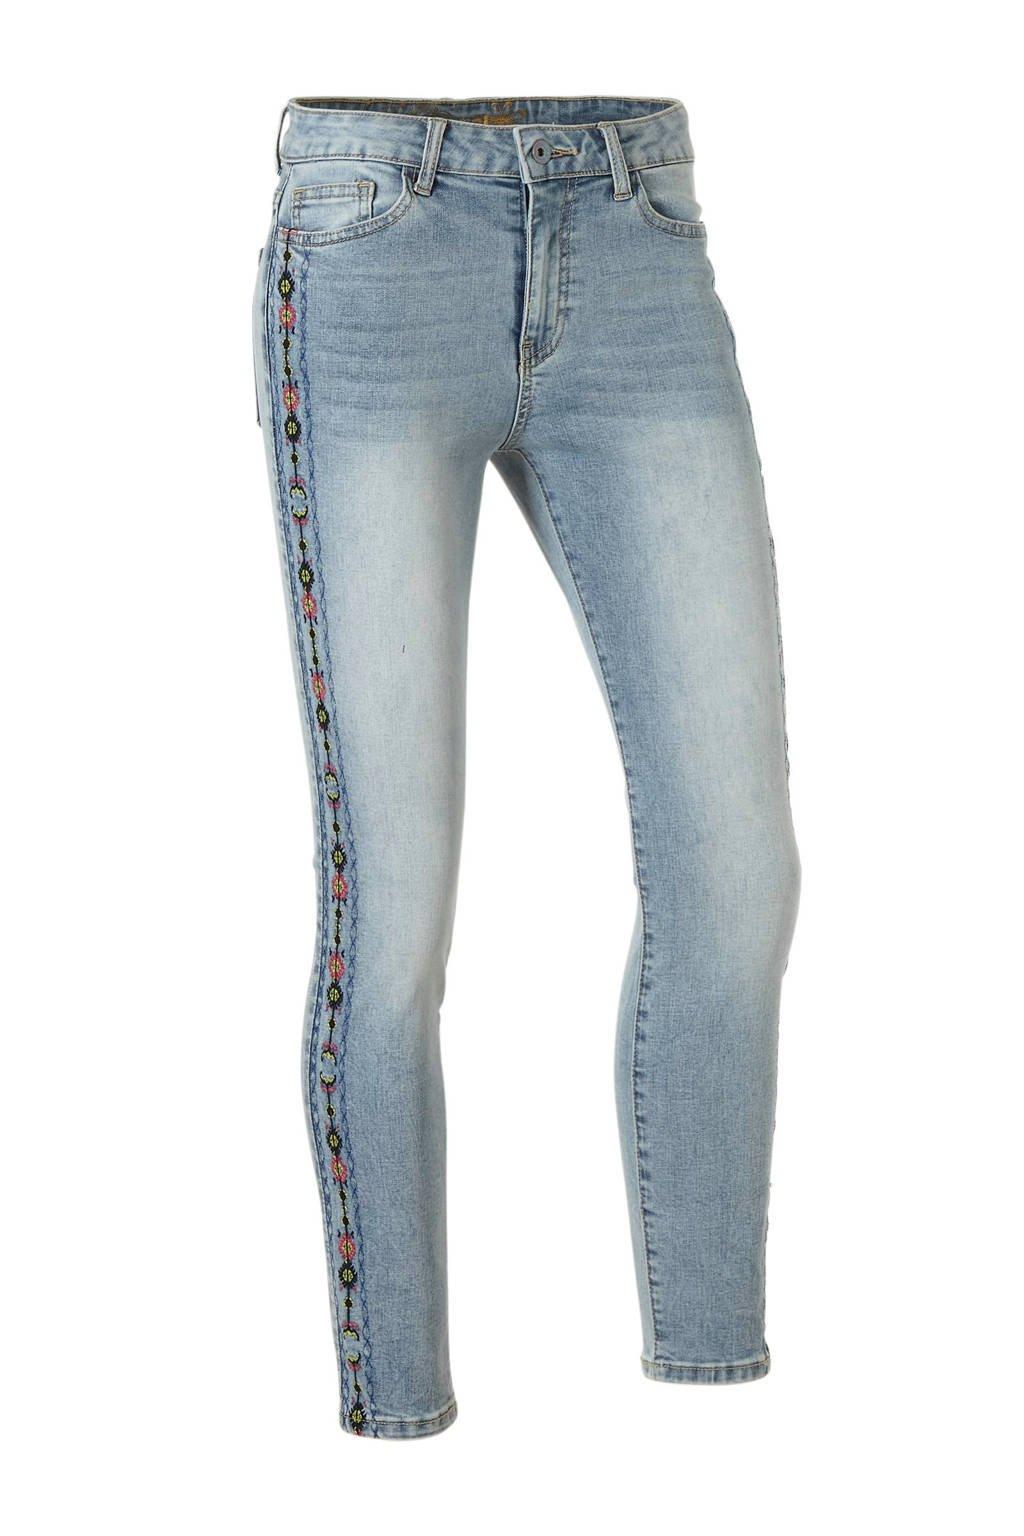 Desigual skinny jeans met borduursels, Lichtblauw